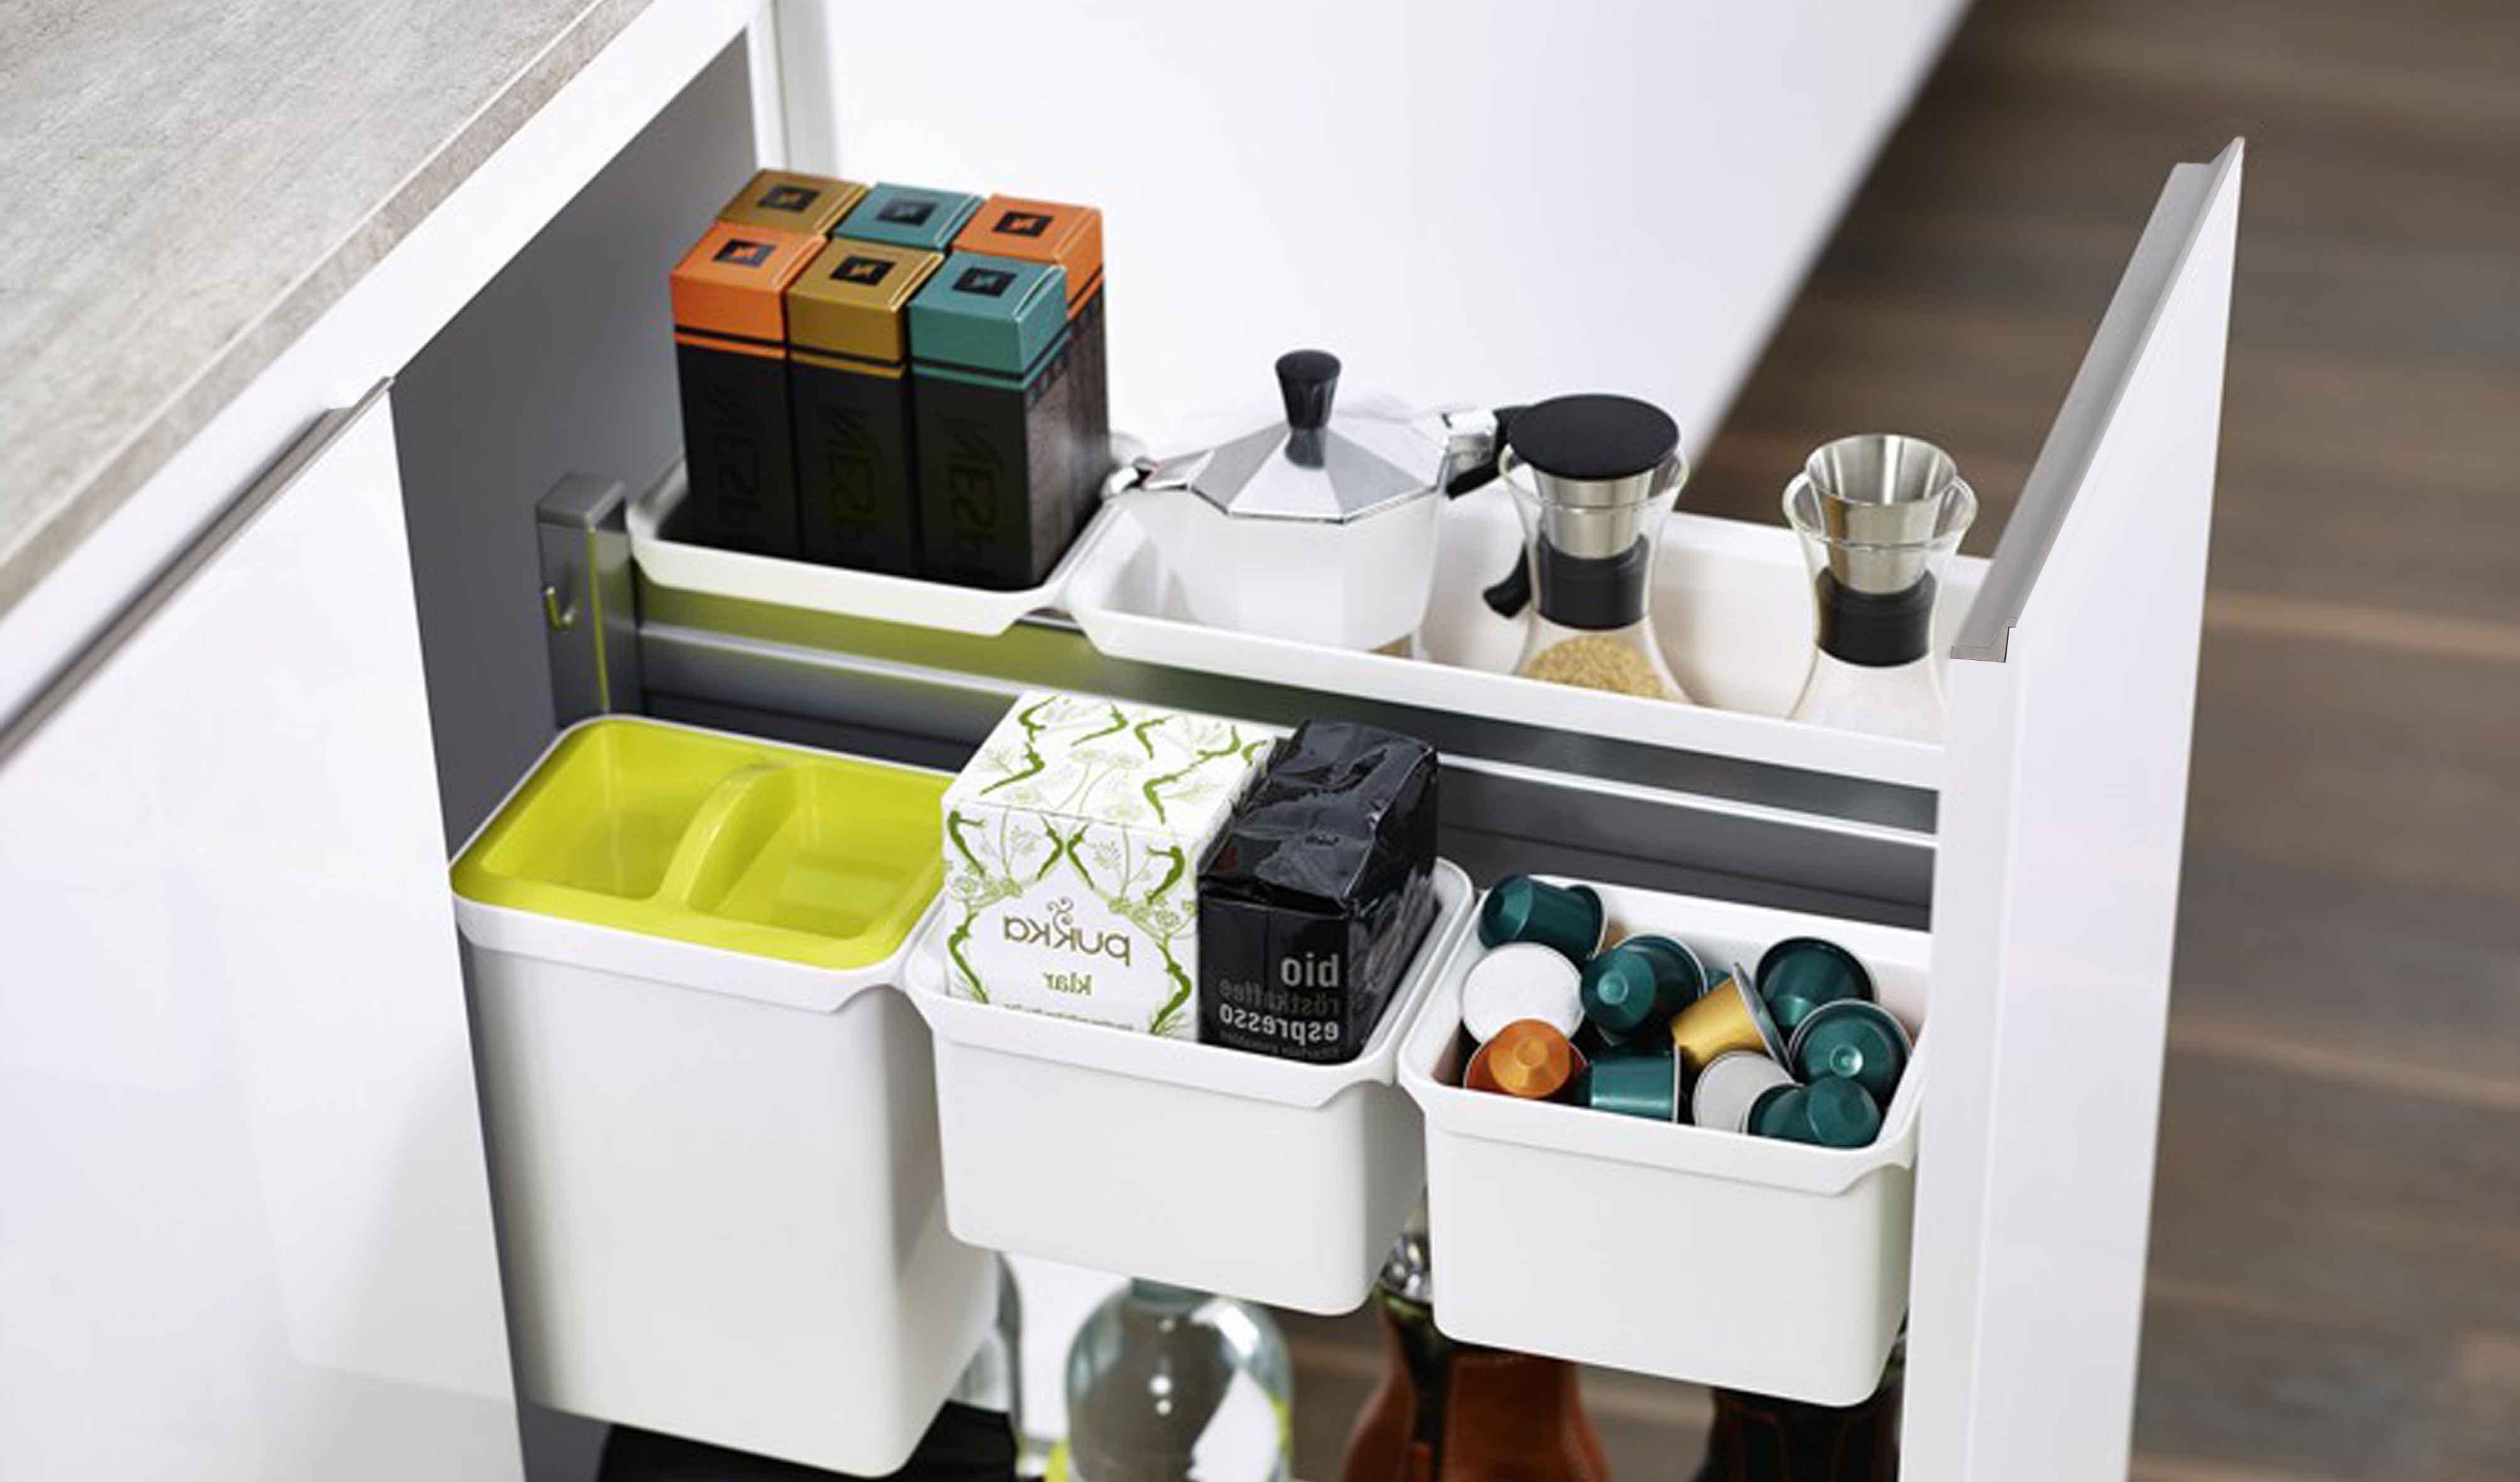 Accesorios Muebles De Cocina Irdz 8 Accesorios Para Muebles De Cocina Realmente Prà Cticos